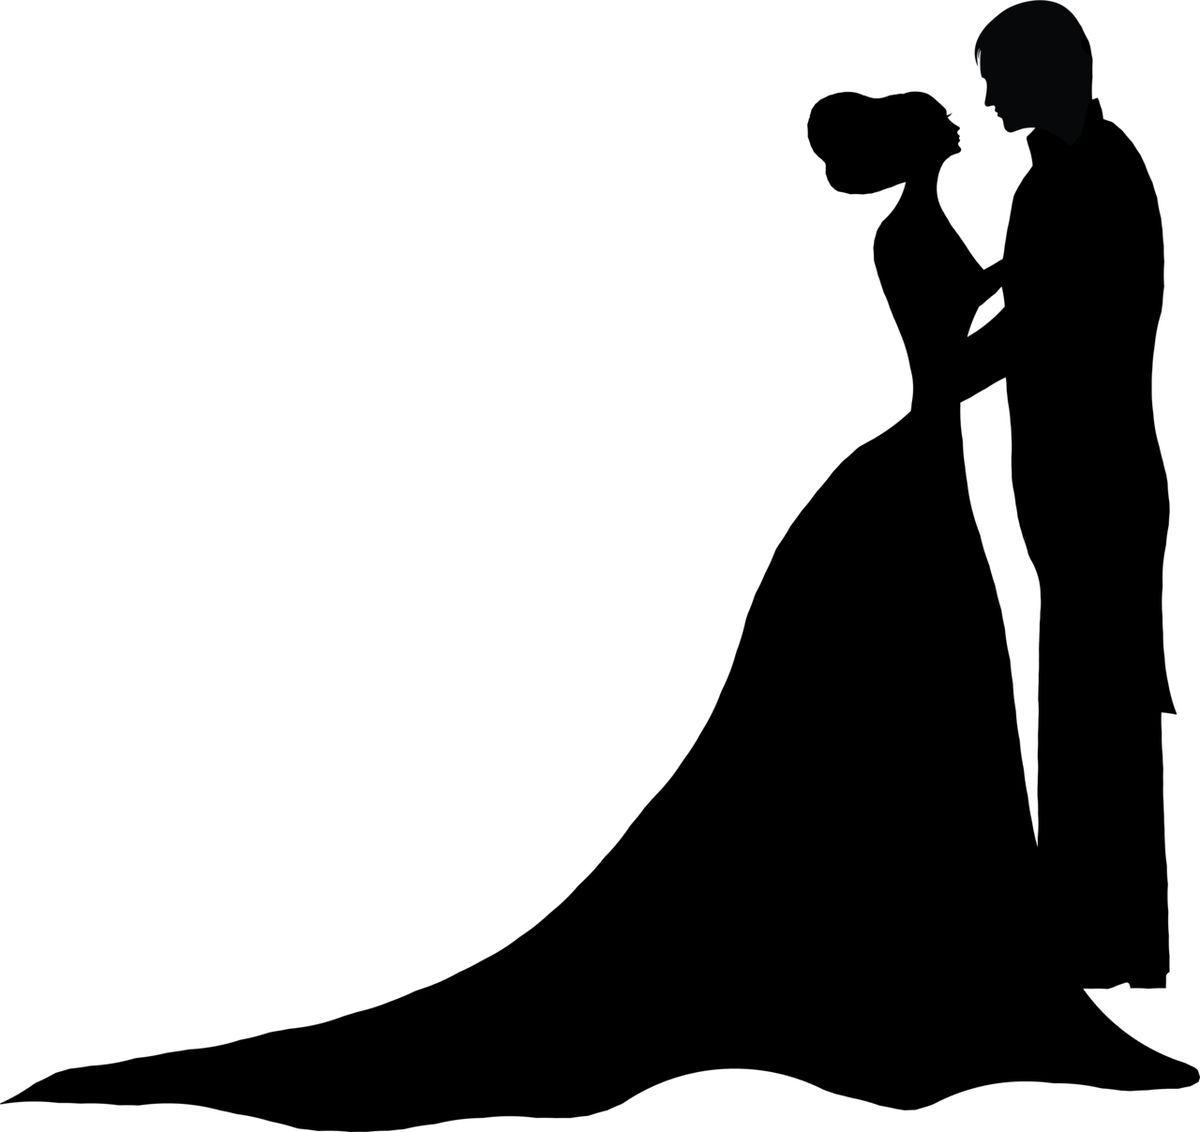 bb328550f56969051c0bad58c1bebbf9 jpg 1 200 1 132 pixels cutting rh pinterest ca  bride and groom silhouette clip art free